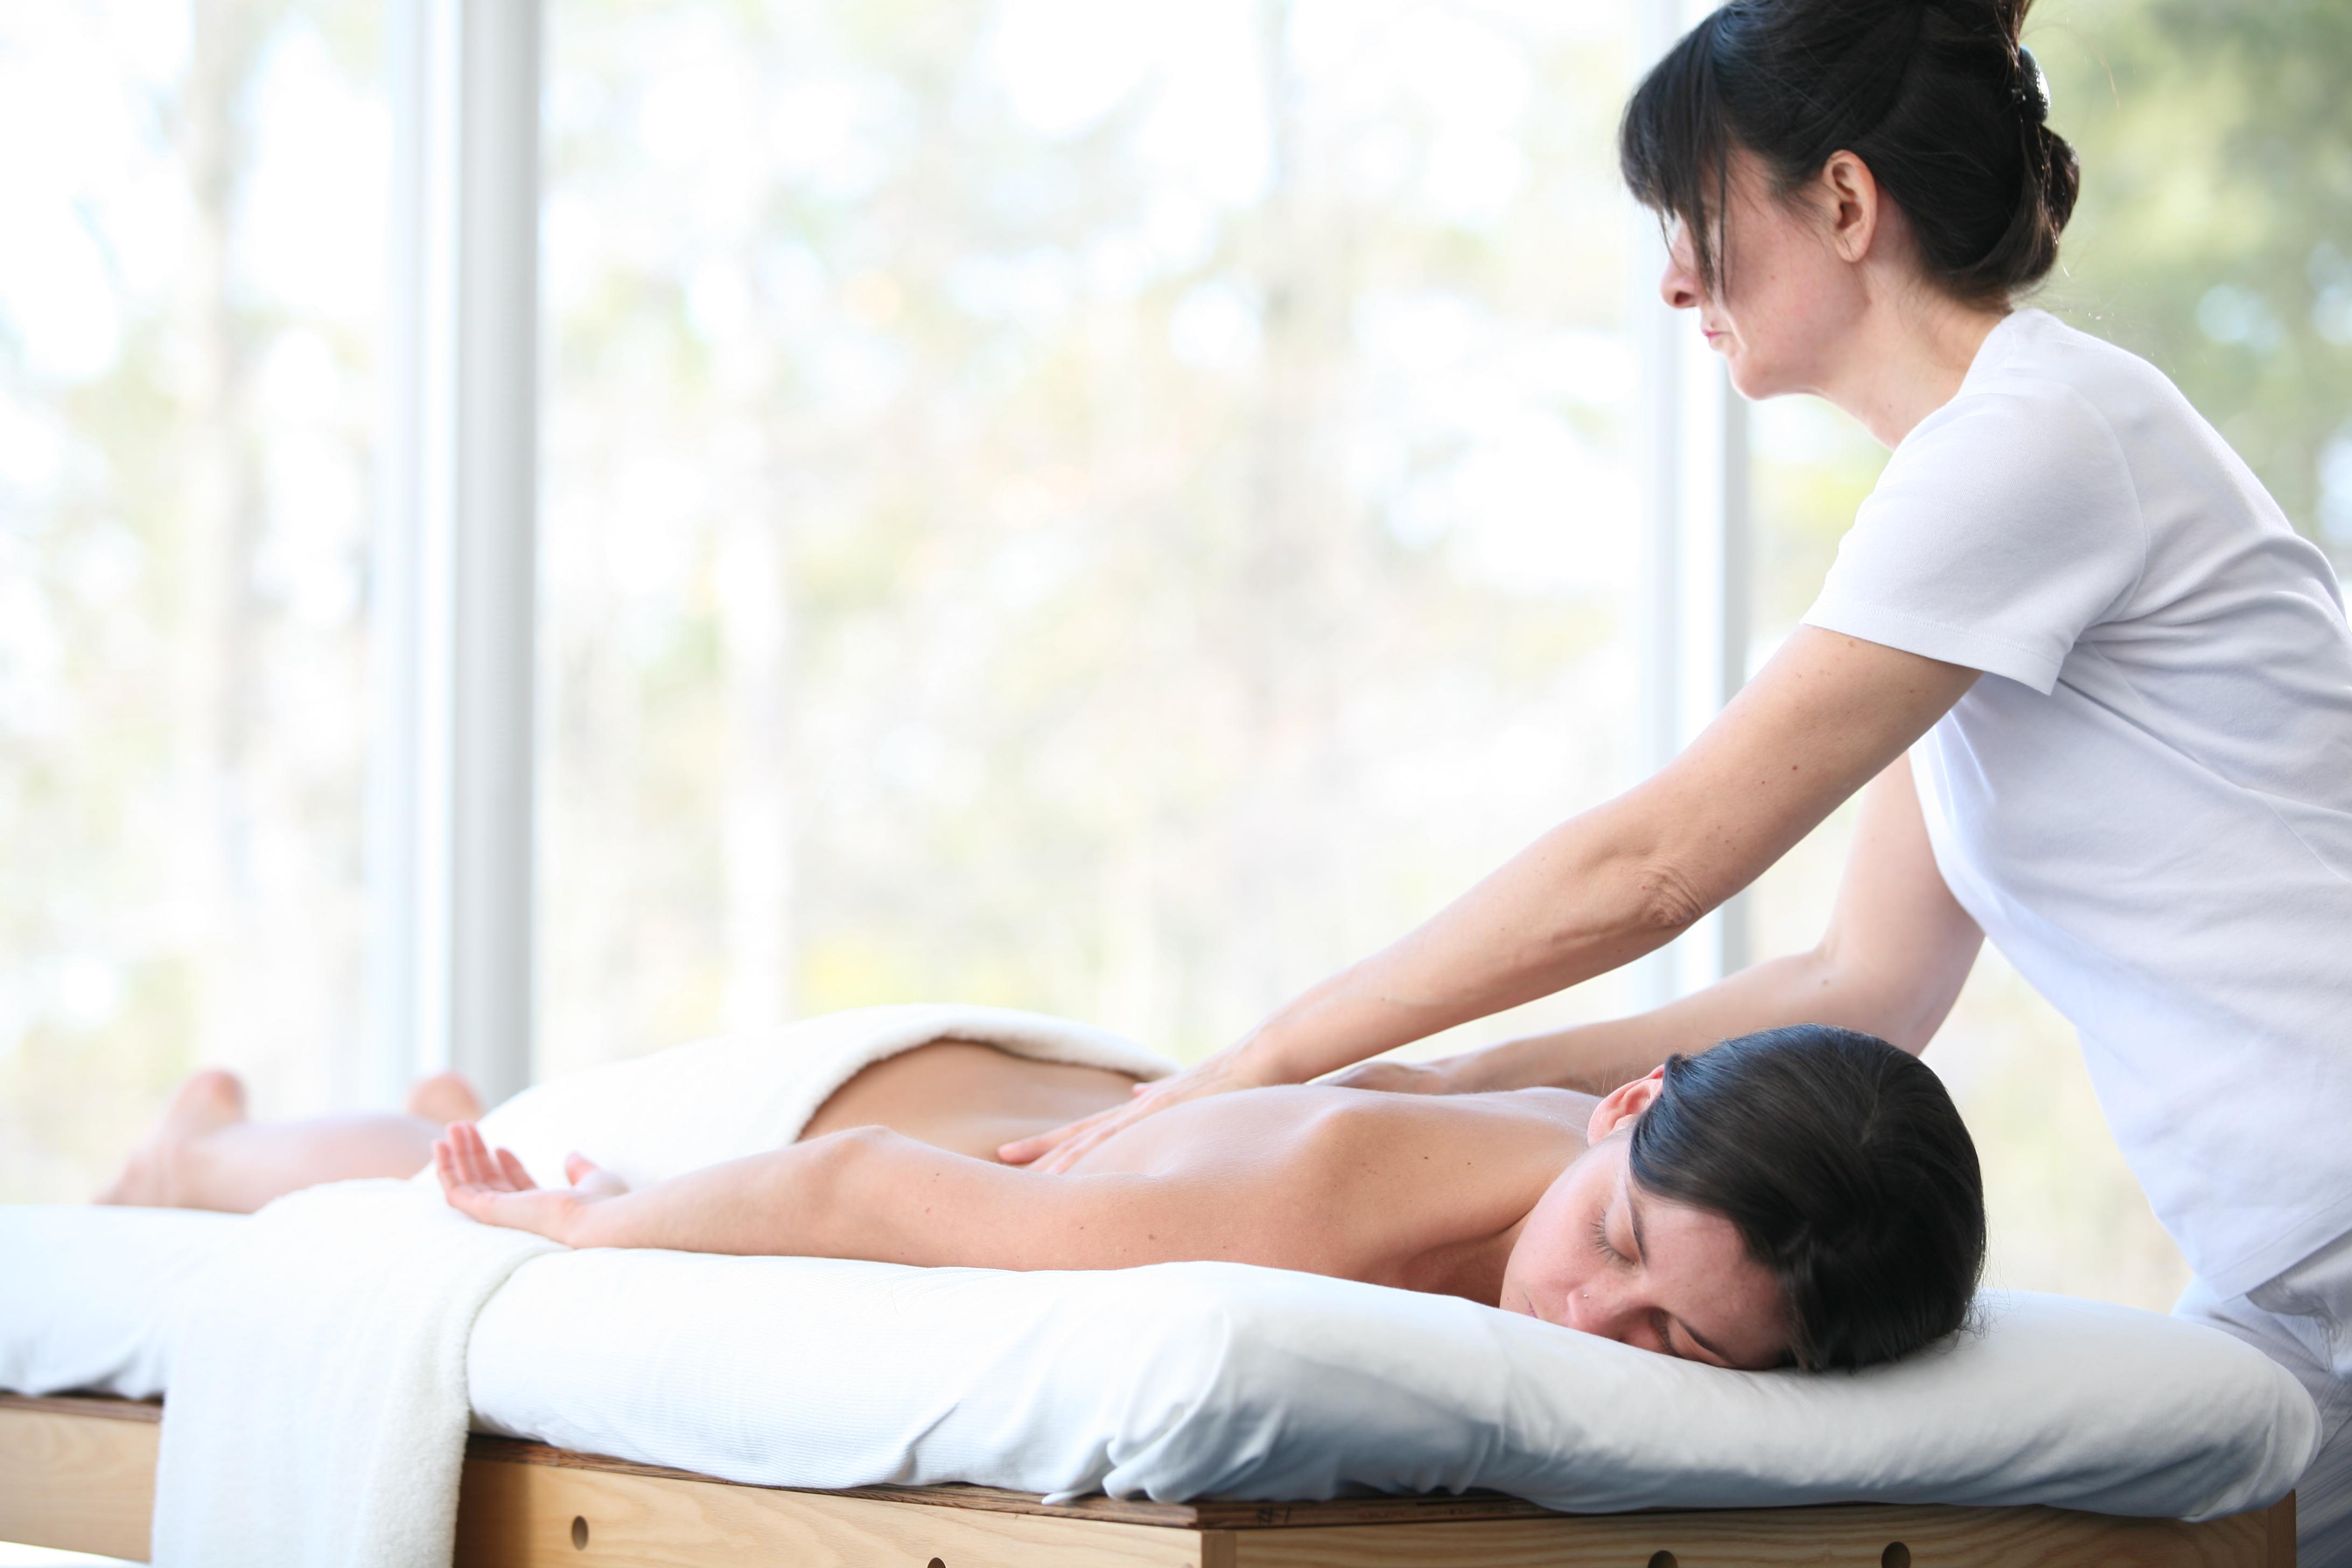 Auberge-montagne-coupee-health-center-massage